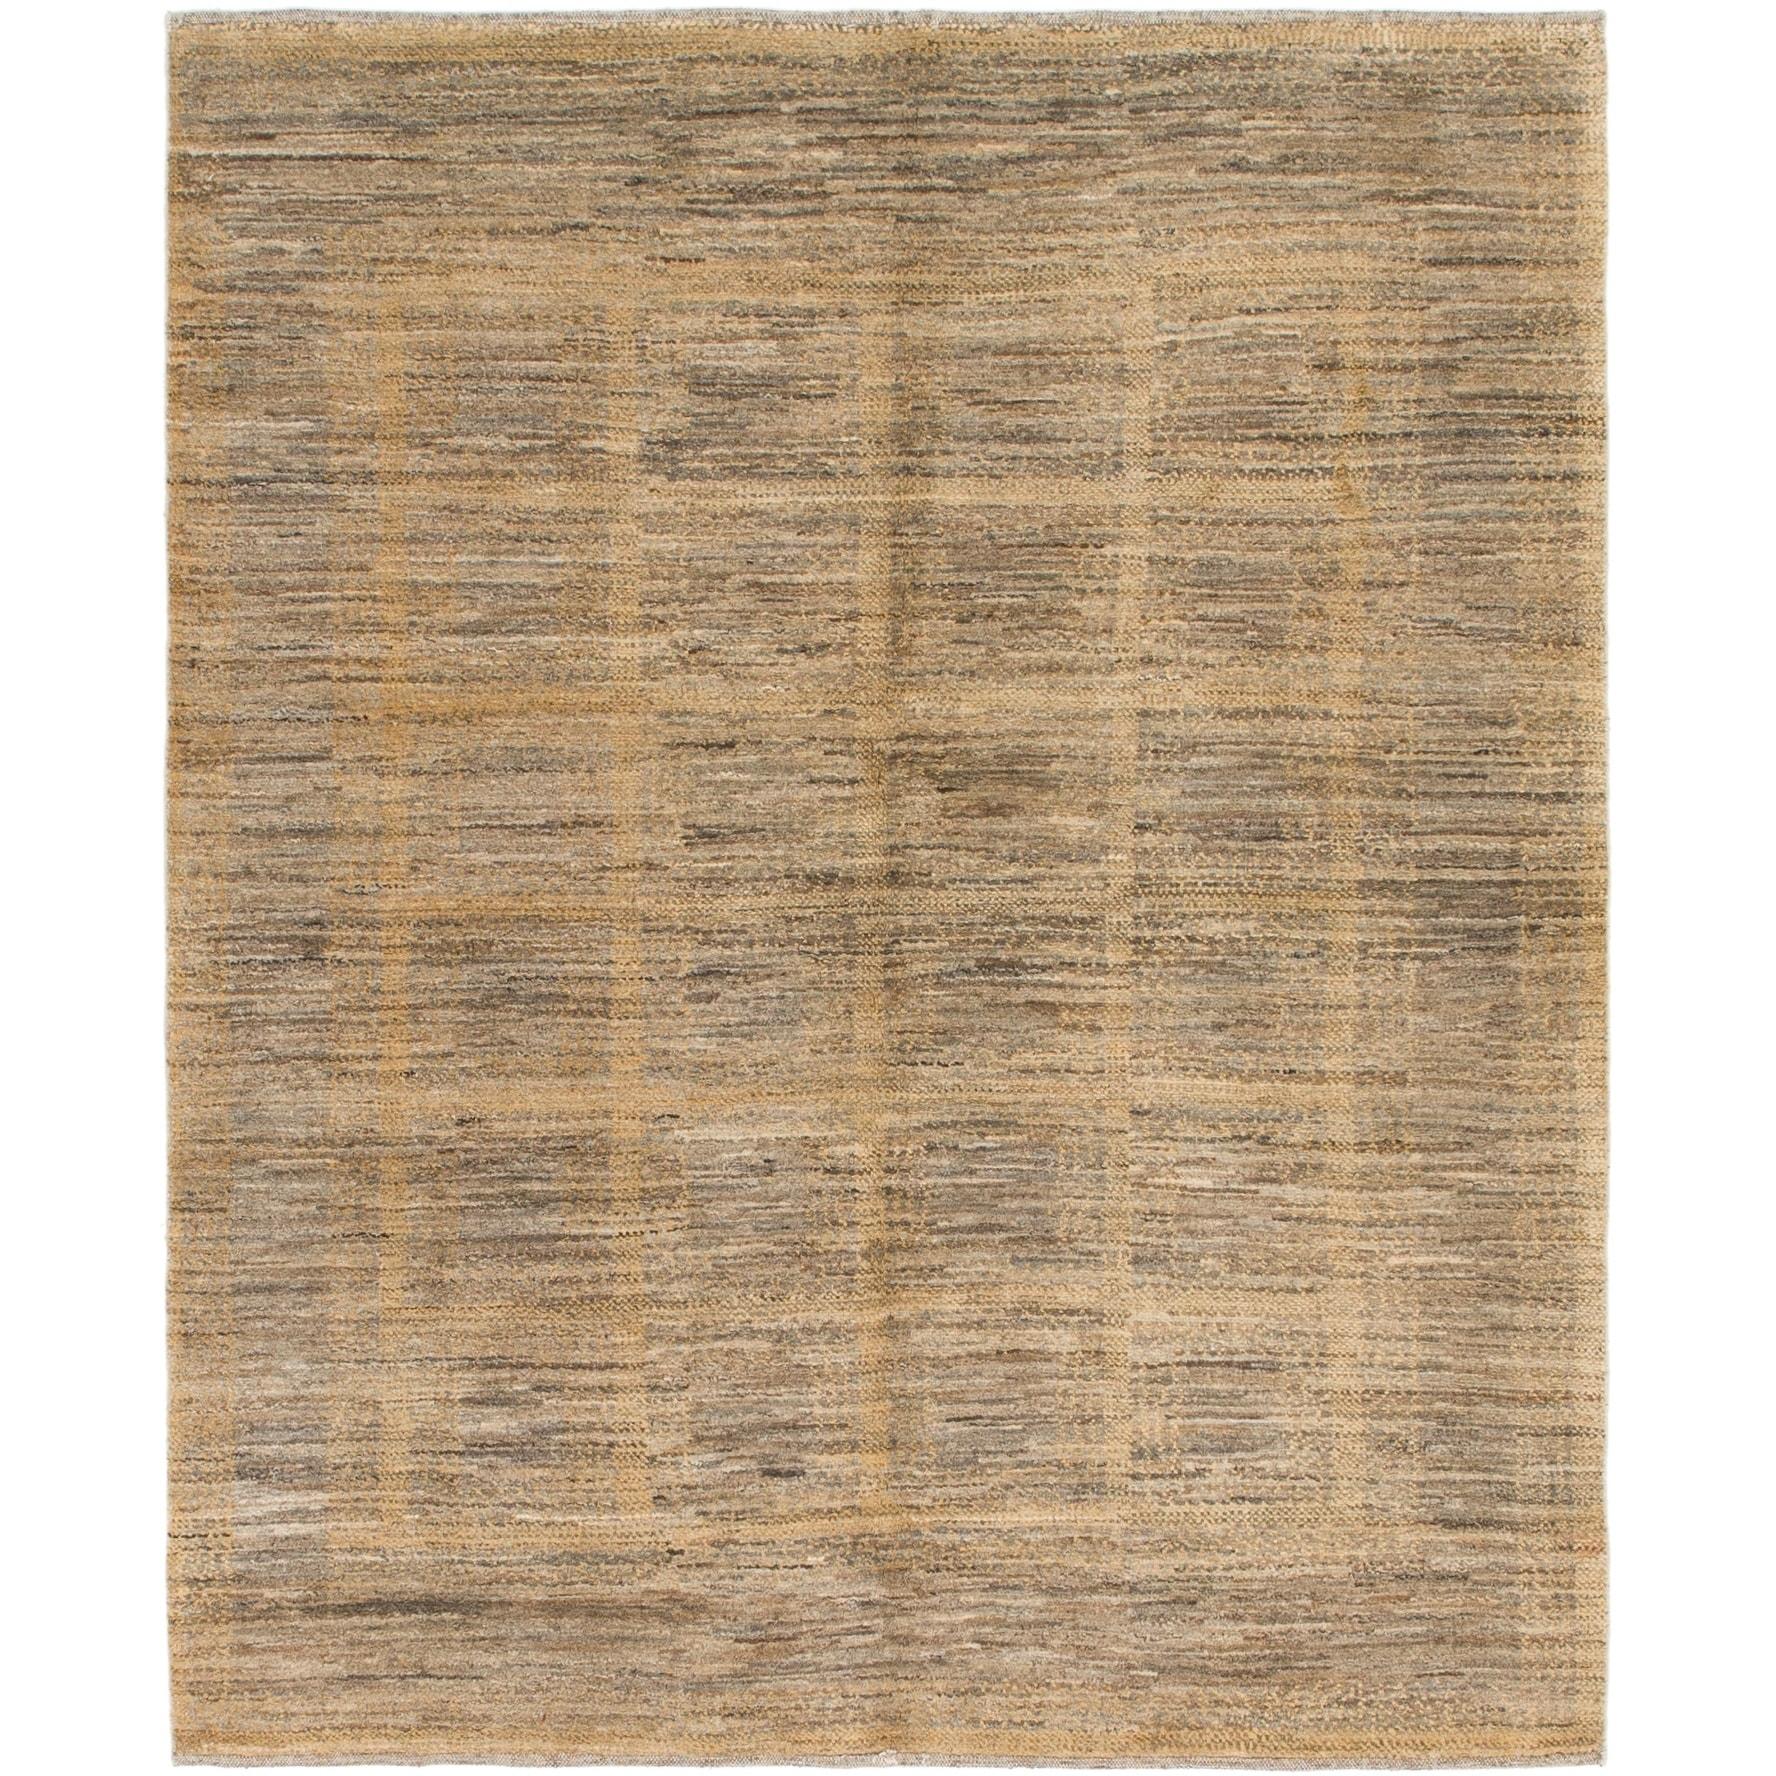 Hand Knotted Kashkuli Gabbeh Wool Area Rug - 5 x 6 4 (Olive - 5 x 6 4)